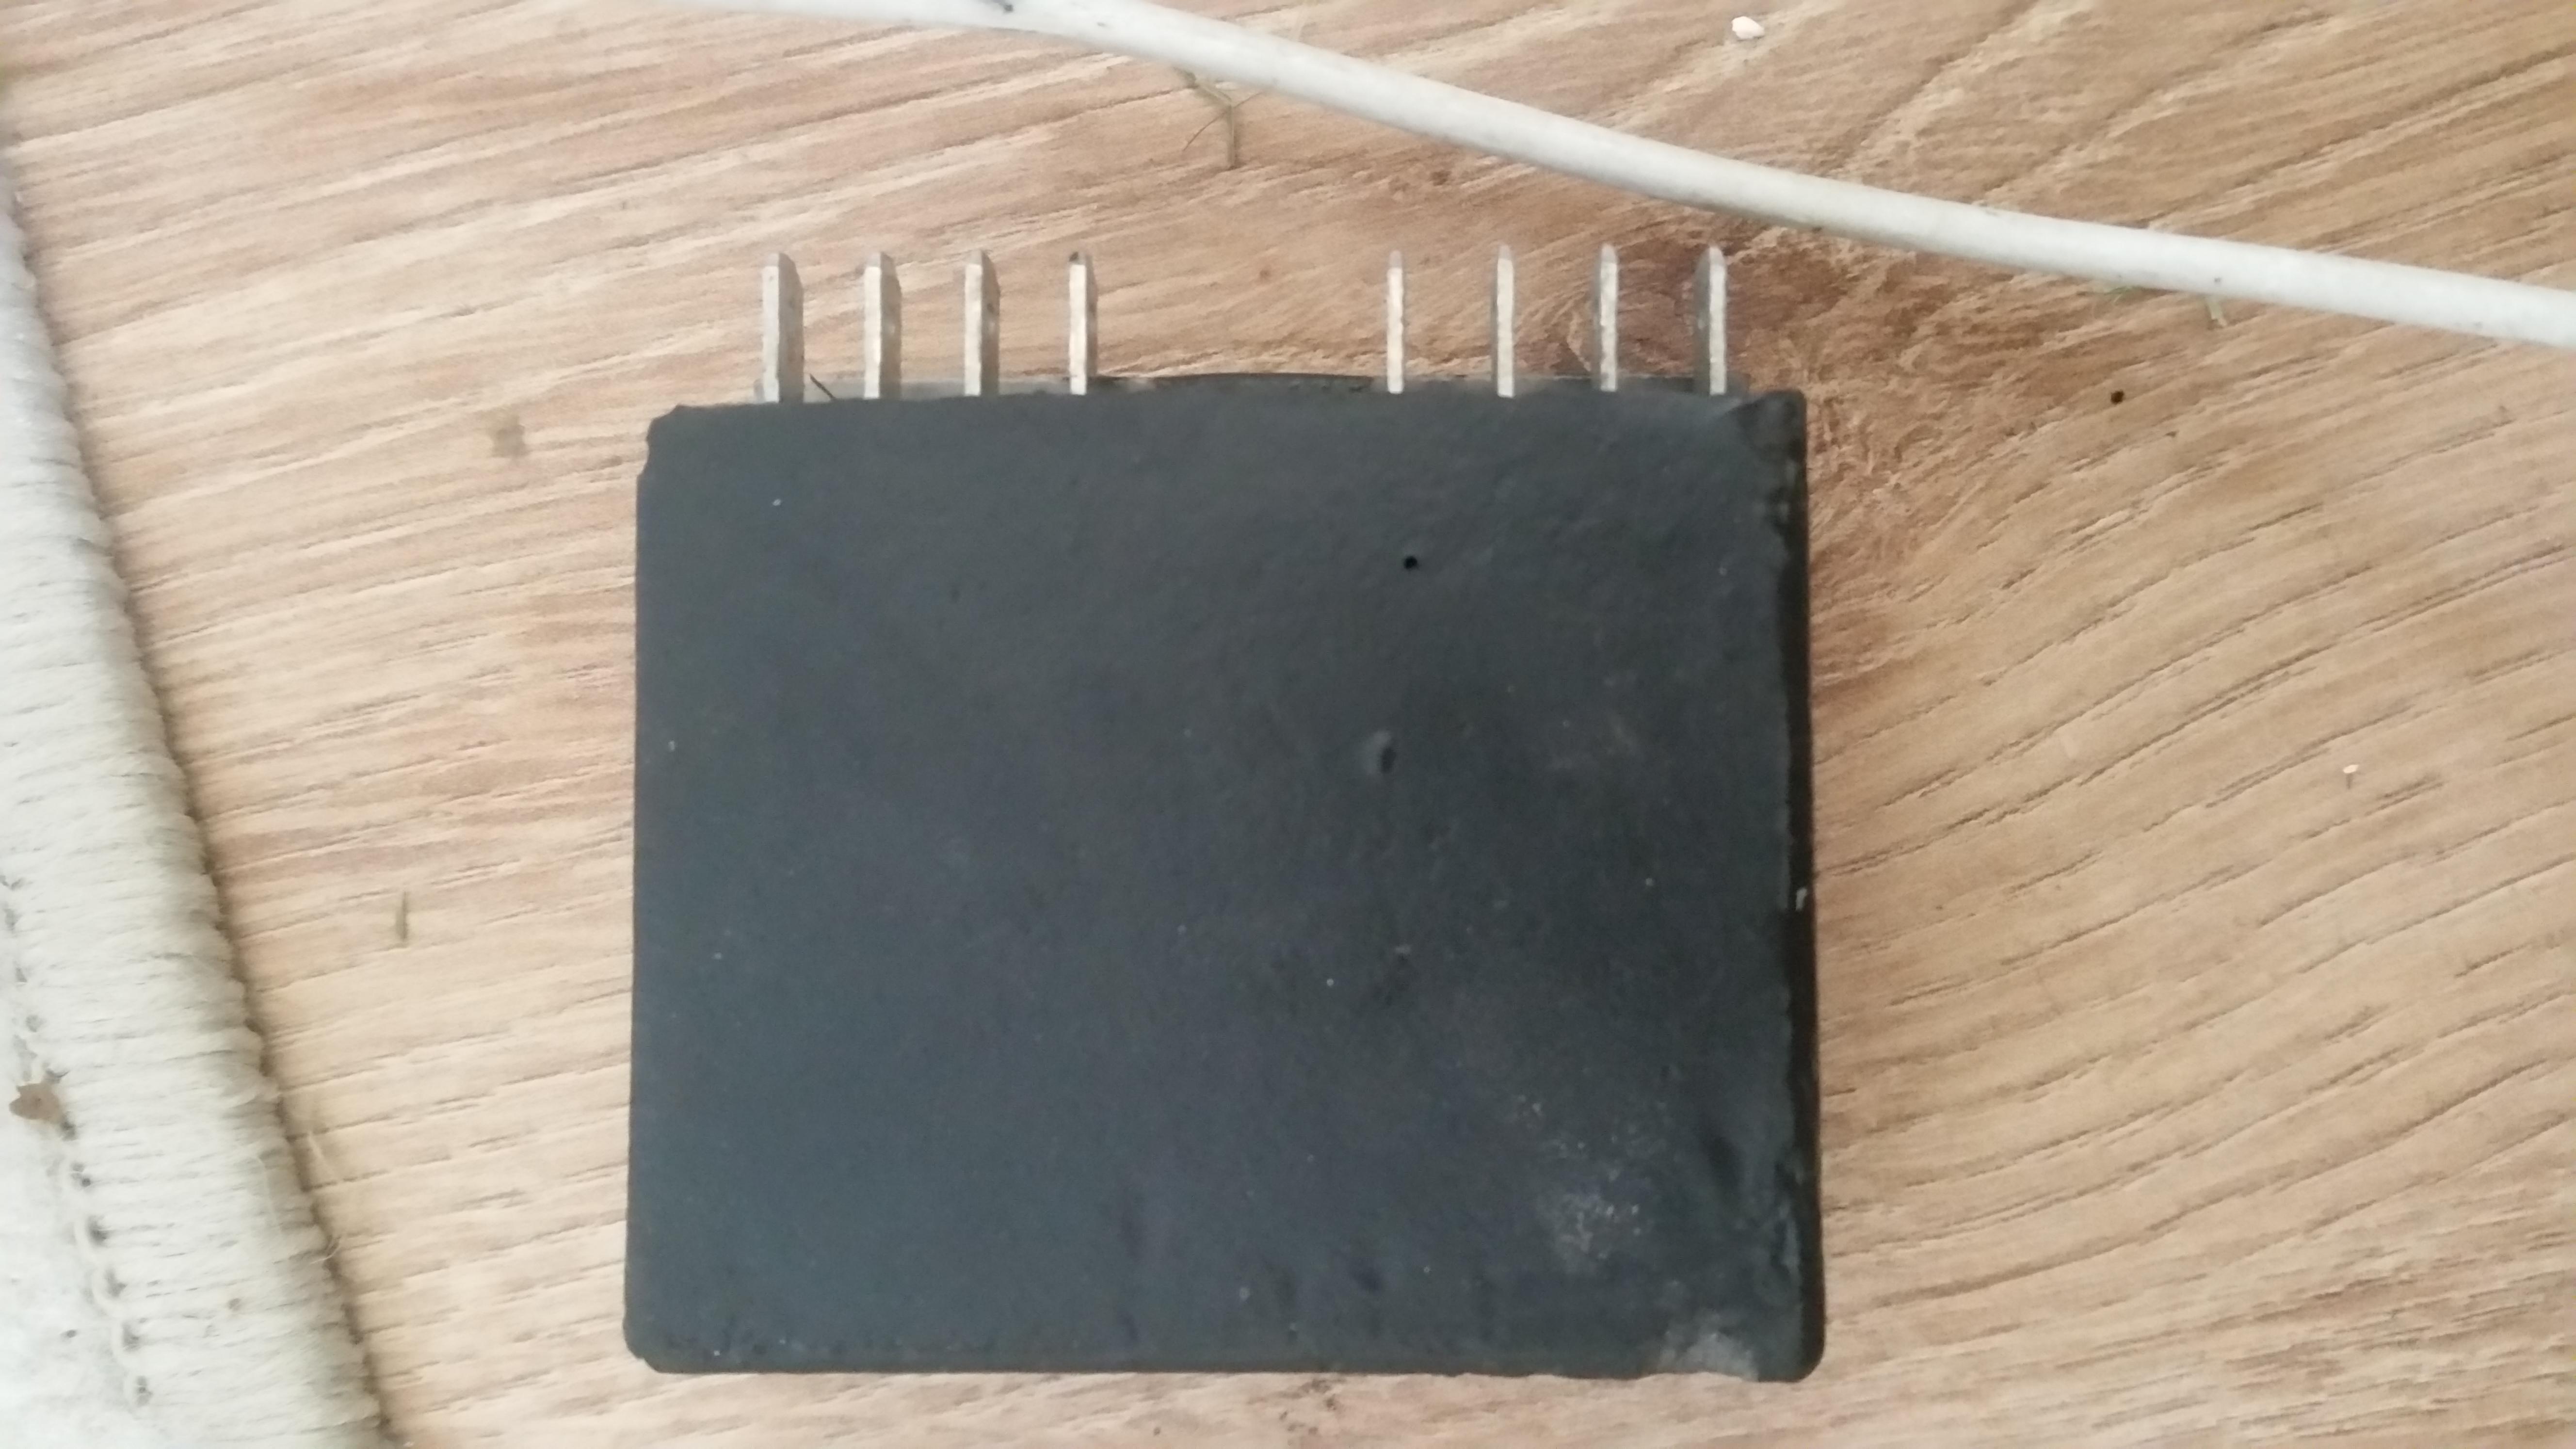 peugeot speedfight 2 100cc wiring diagram | wiring library peugeot speedfight 2 100cc wiring diagram